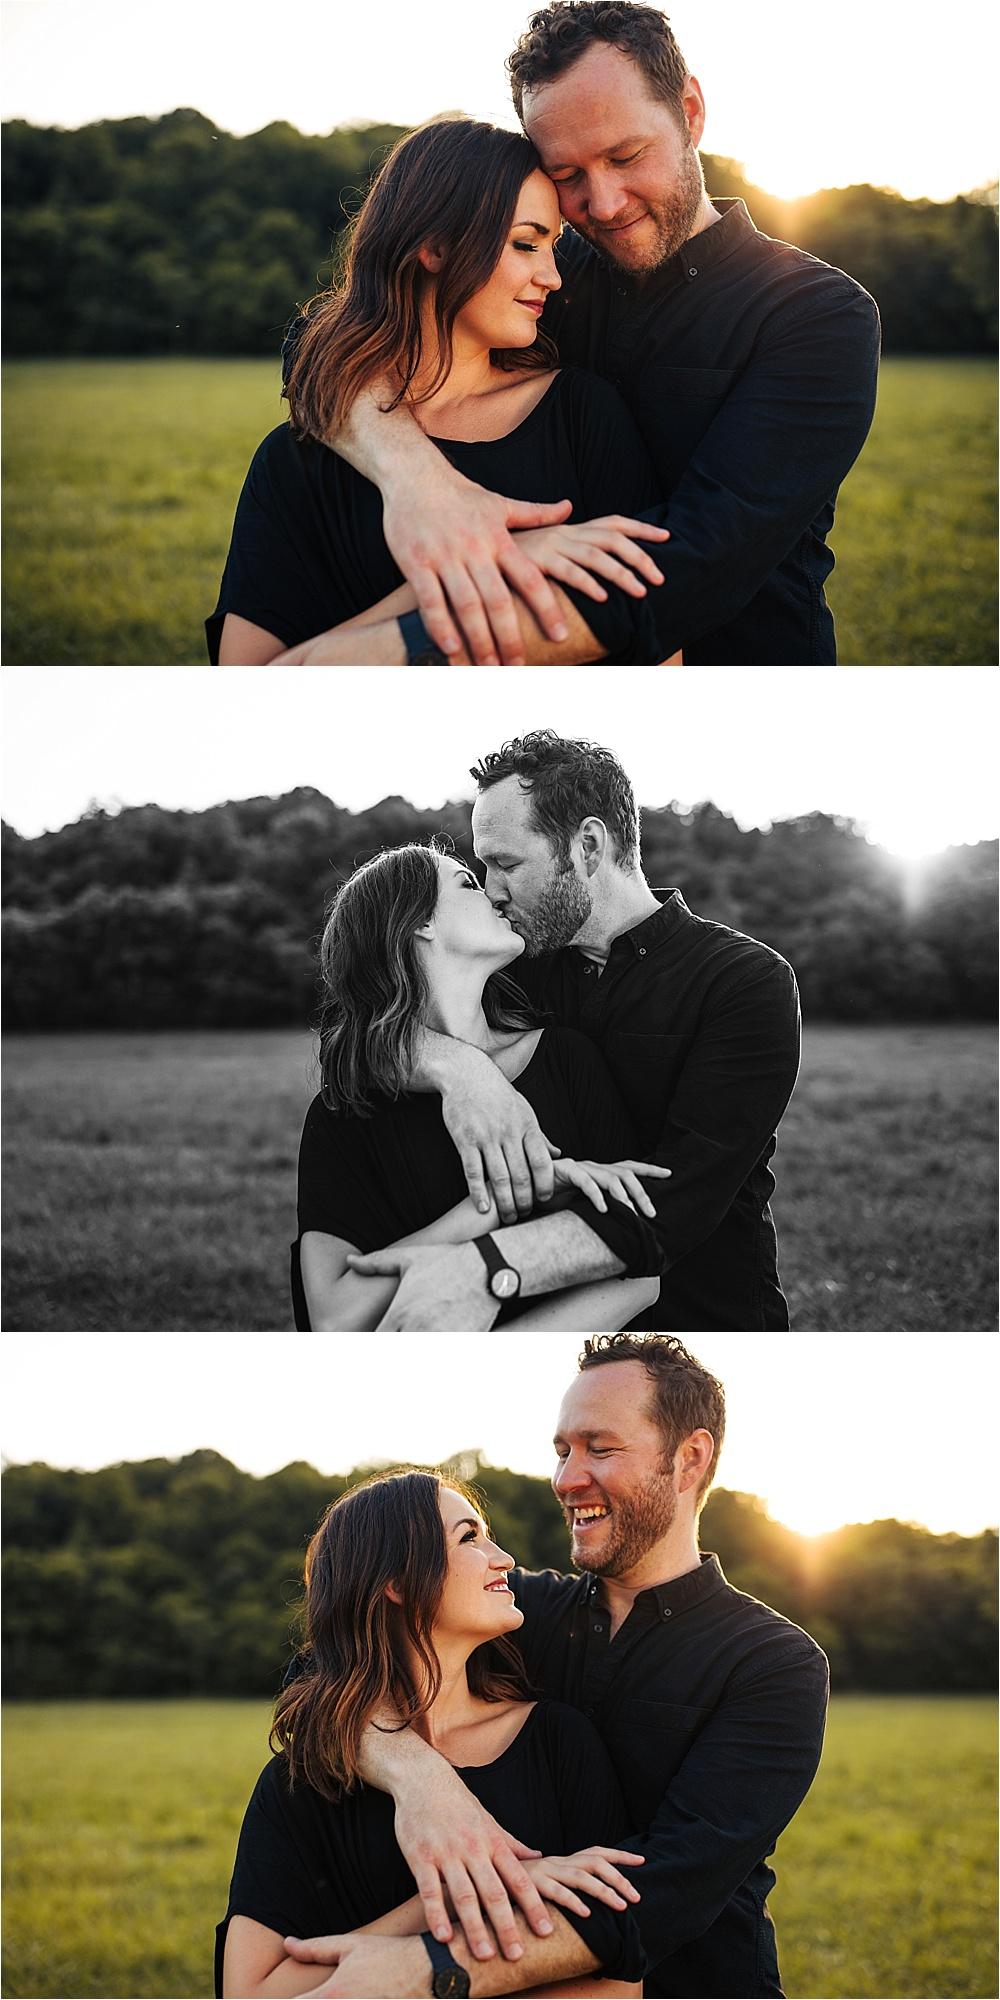 CK-Photo-Nashville-engagement-wedding-photographer-jm